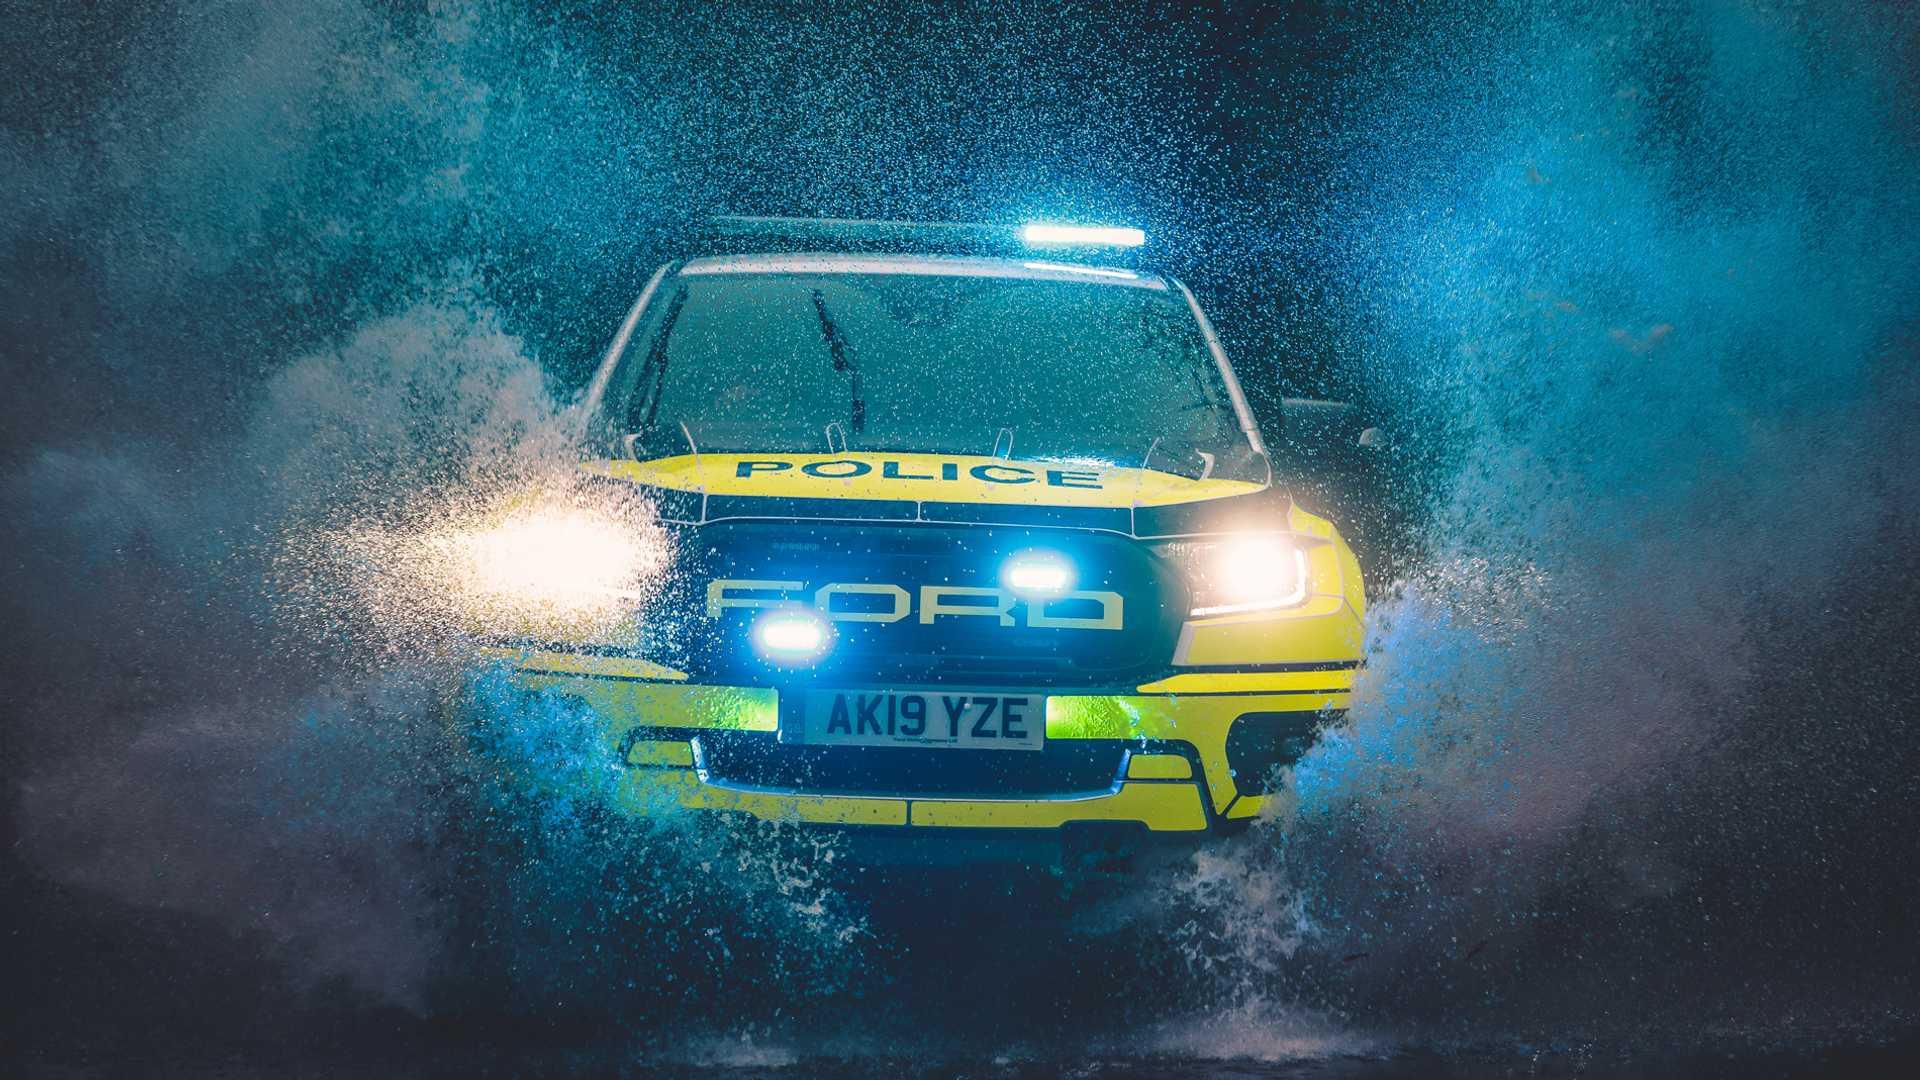 Ford-Focus-ST-and-Ranger-Raptor-UK-police-cars-16